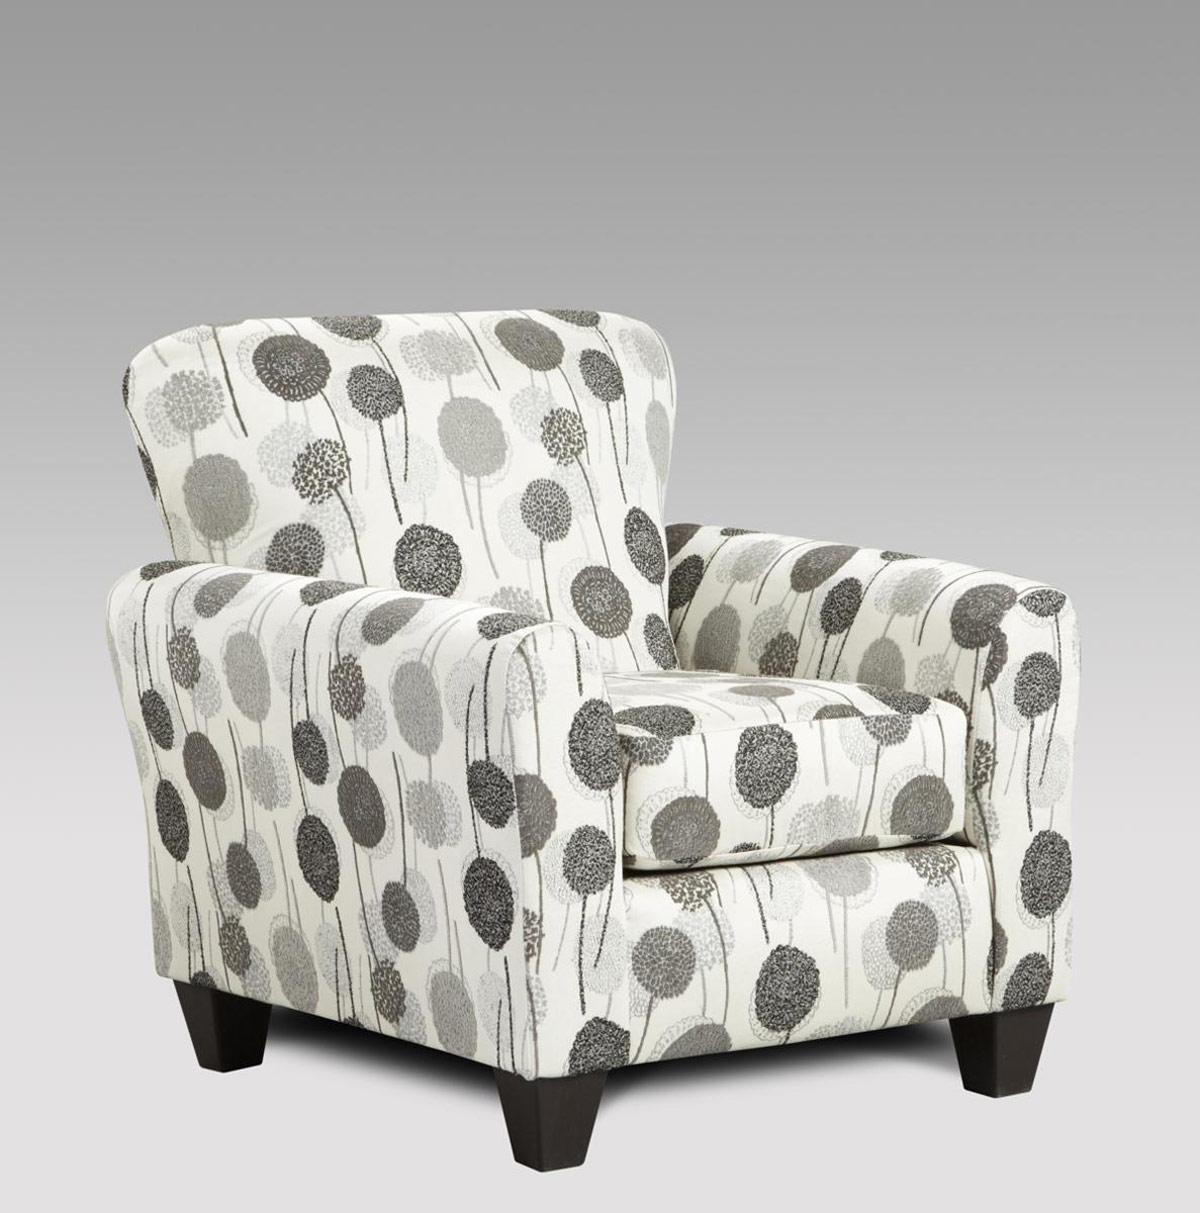 Chelsea Home Worcester Accent Chair - Wonderland Ash